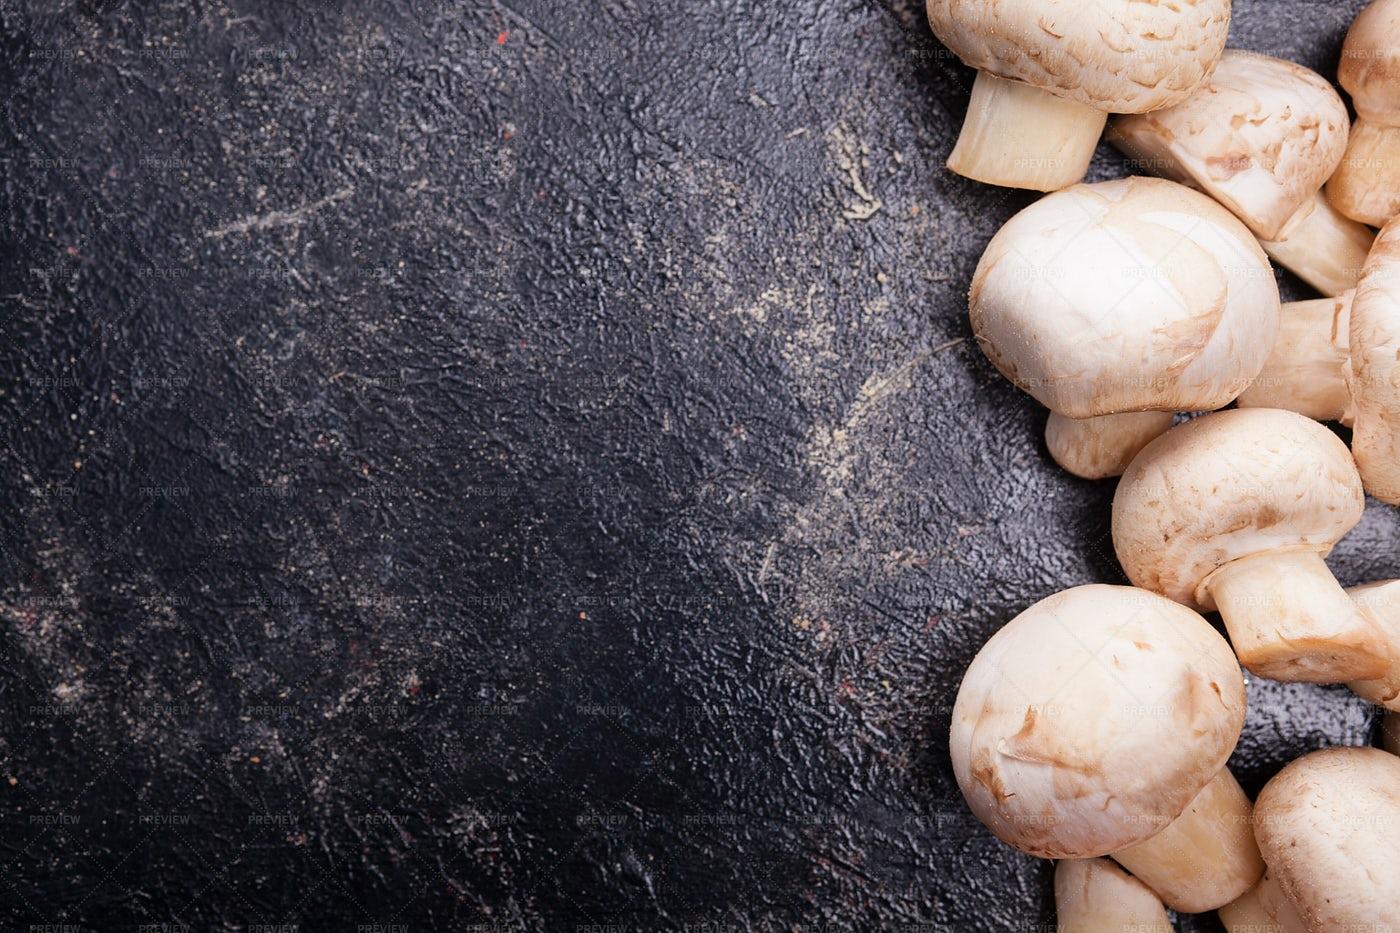 White Mushrooms On Counter: Stock Photos